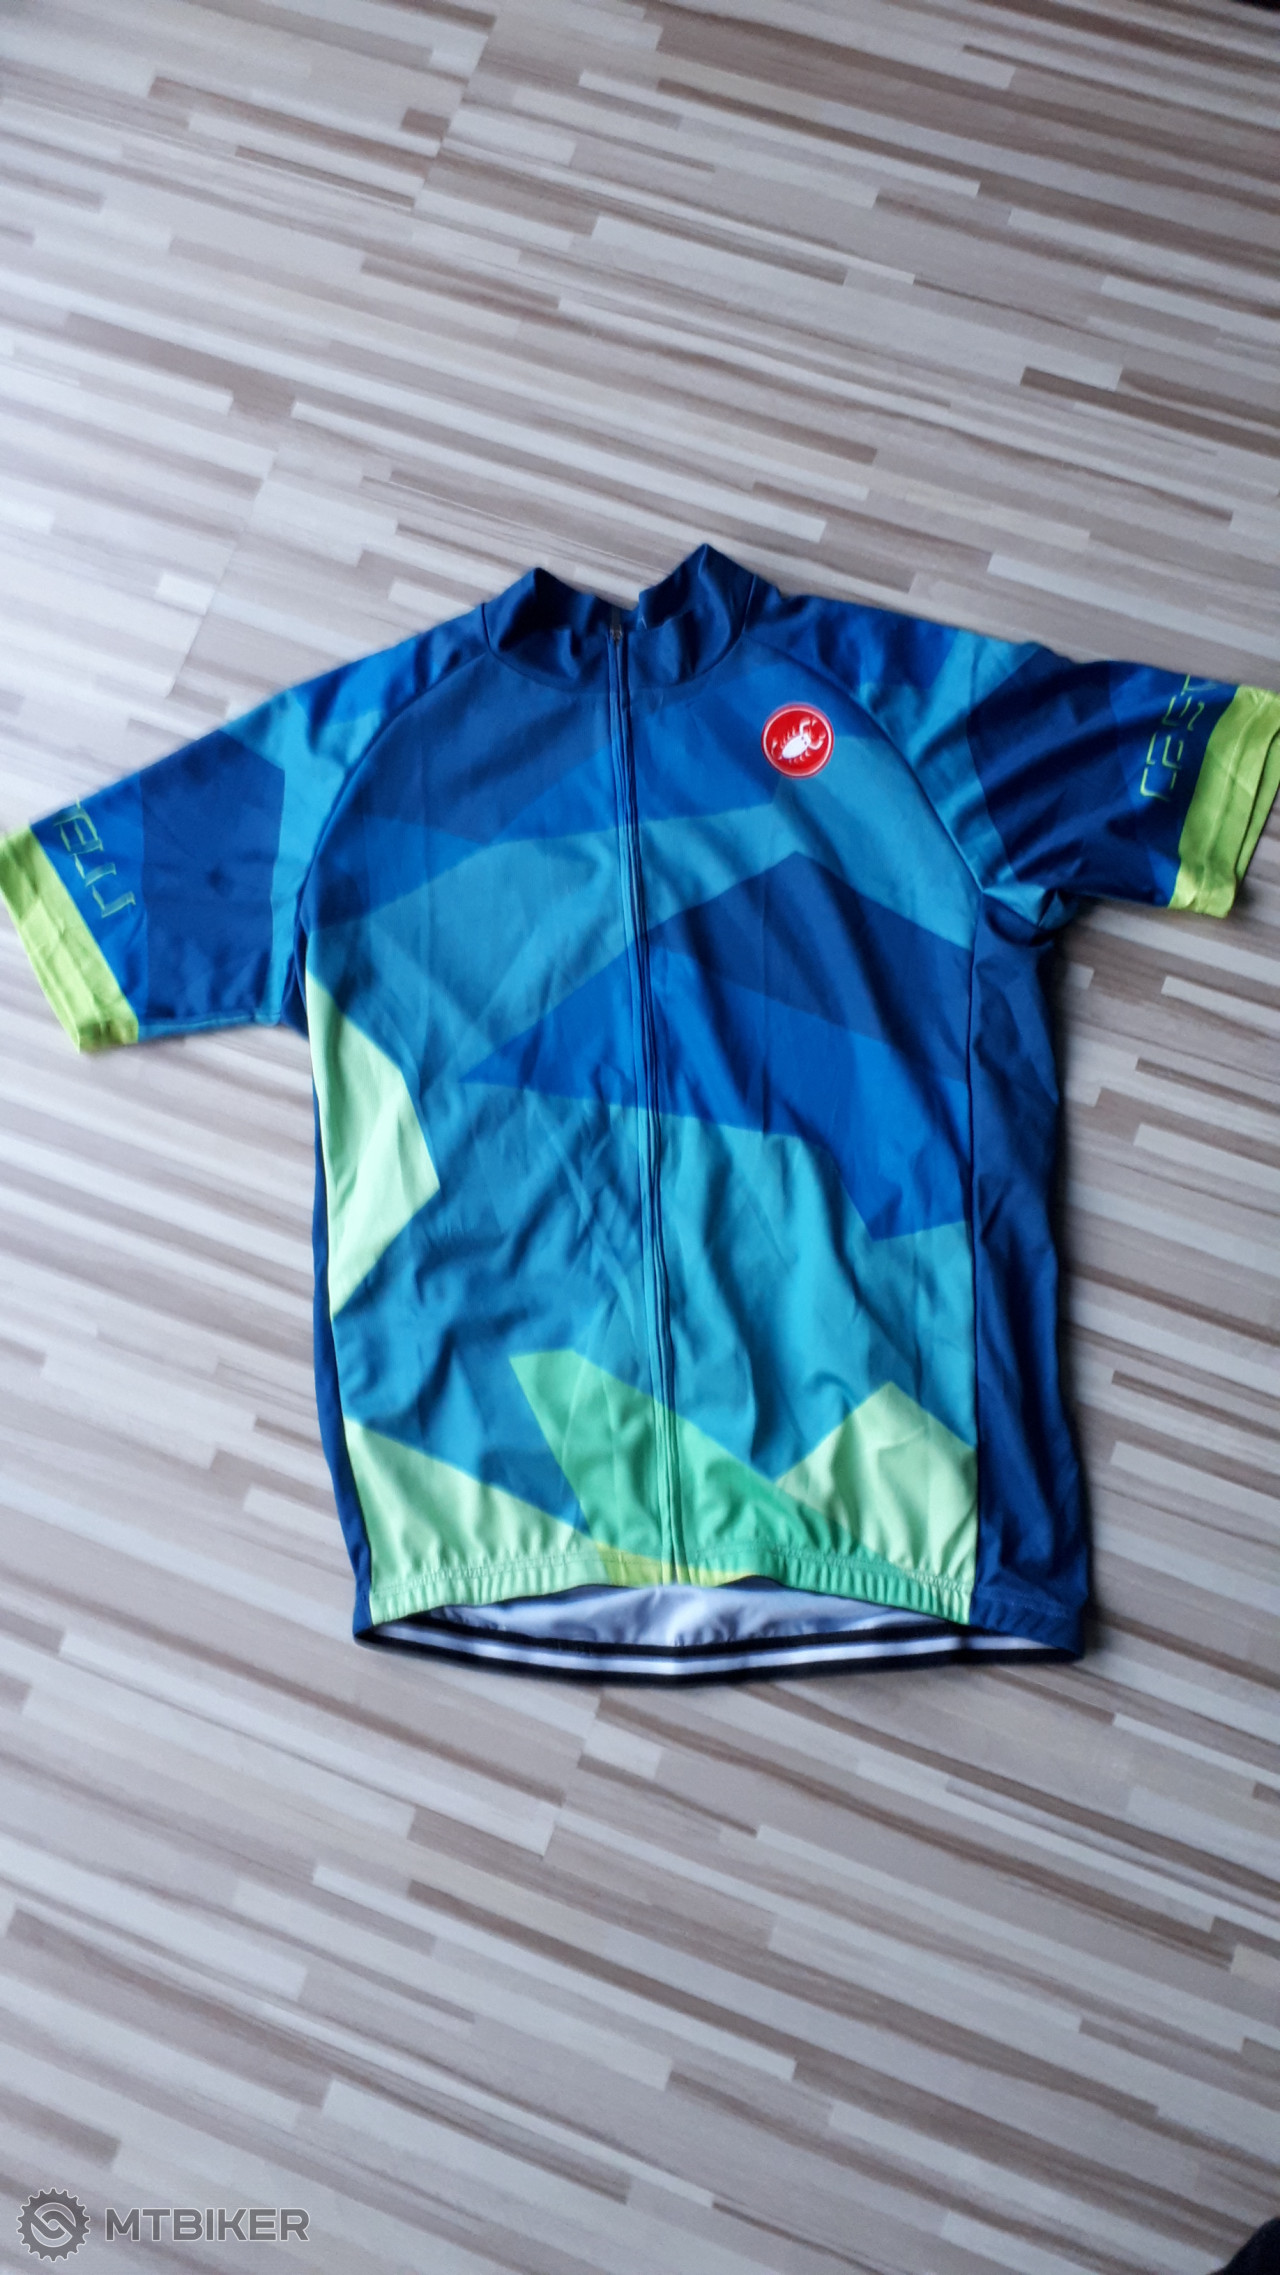 e26f8ace2ee3c Cyklodres Castelli - Príslušenstvo - Oblečenie a batohy - Bazár MTBIKER